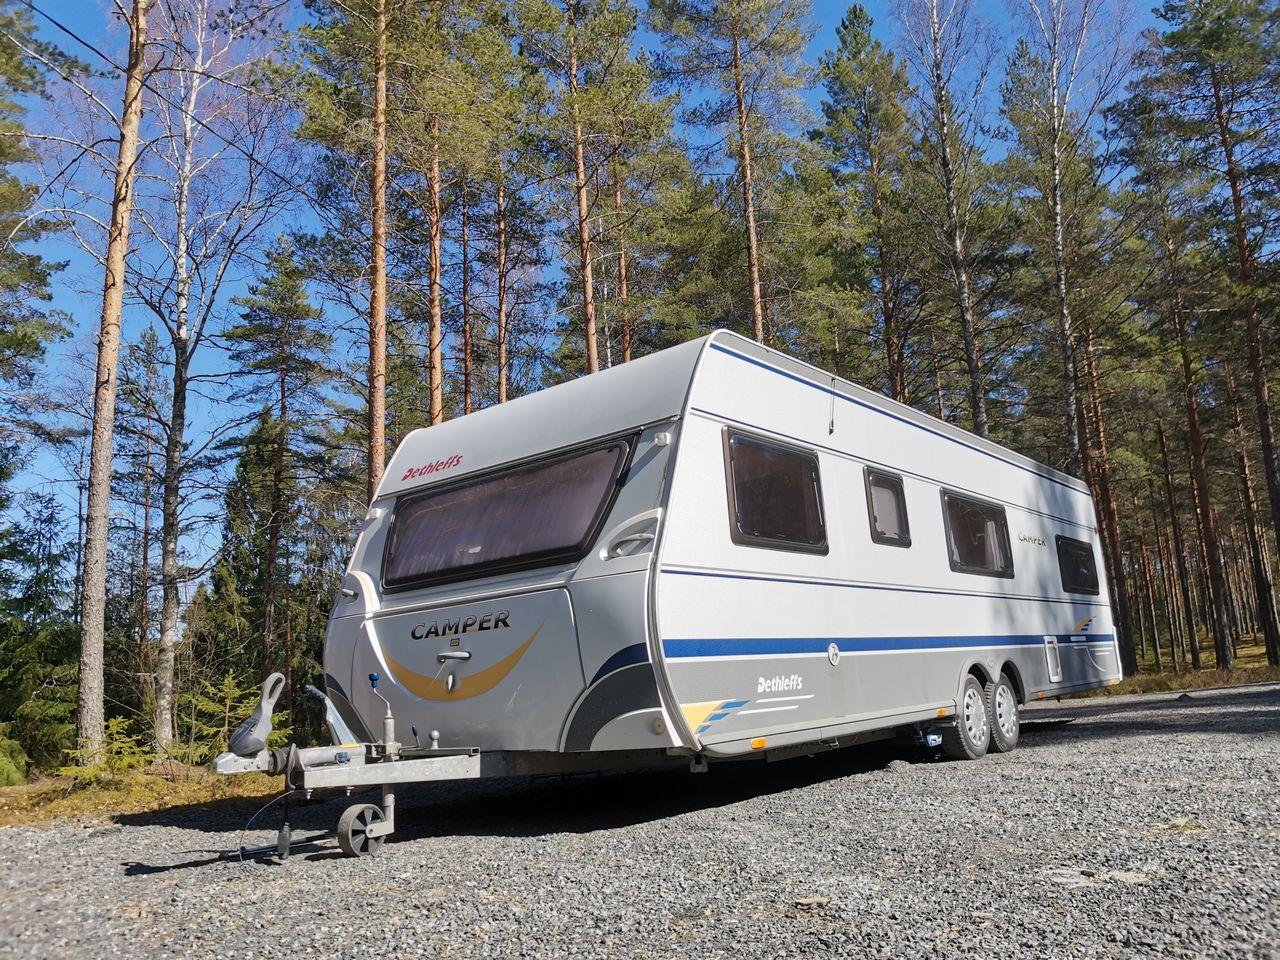 Perheen uusi lomakoti Dethleffs Camper 740TK